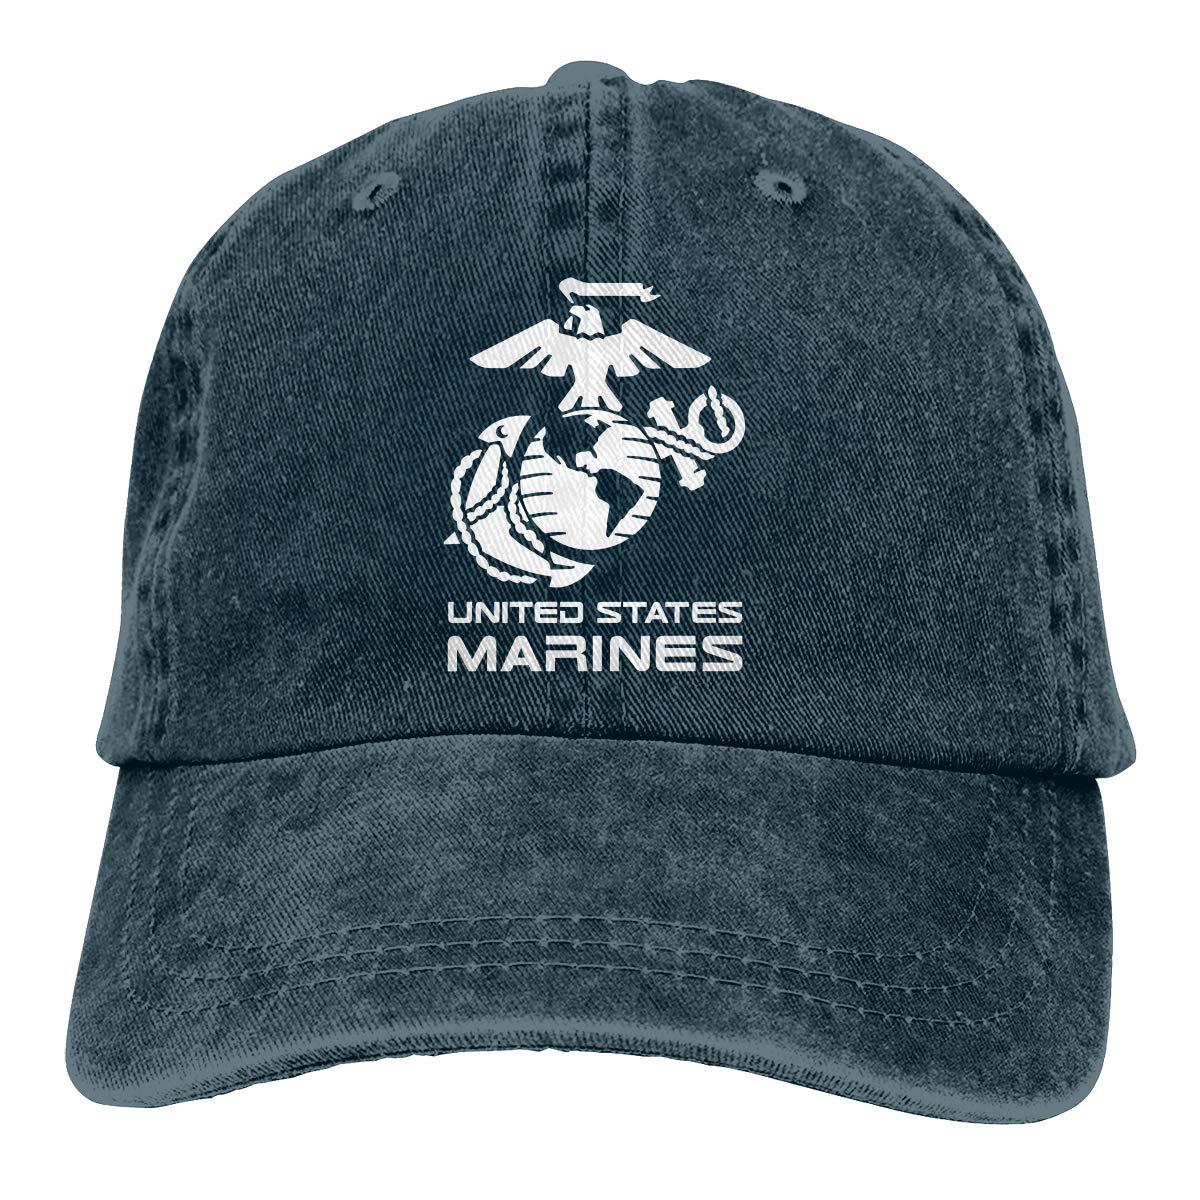 United States Marine Corps Fashion Adjustable Cowboy Cap Baseball Cap for Women and Men